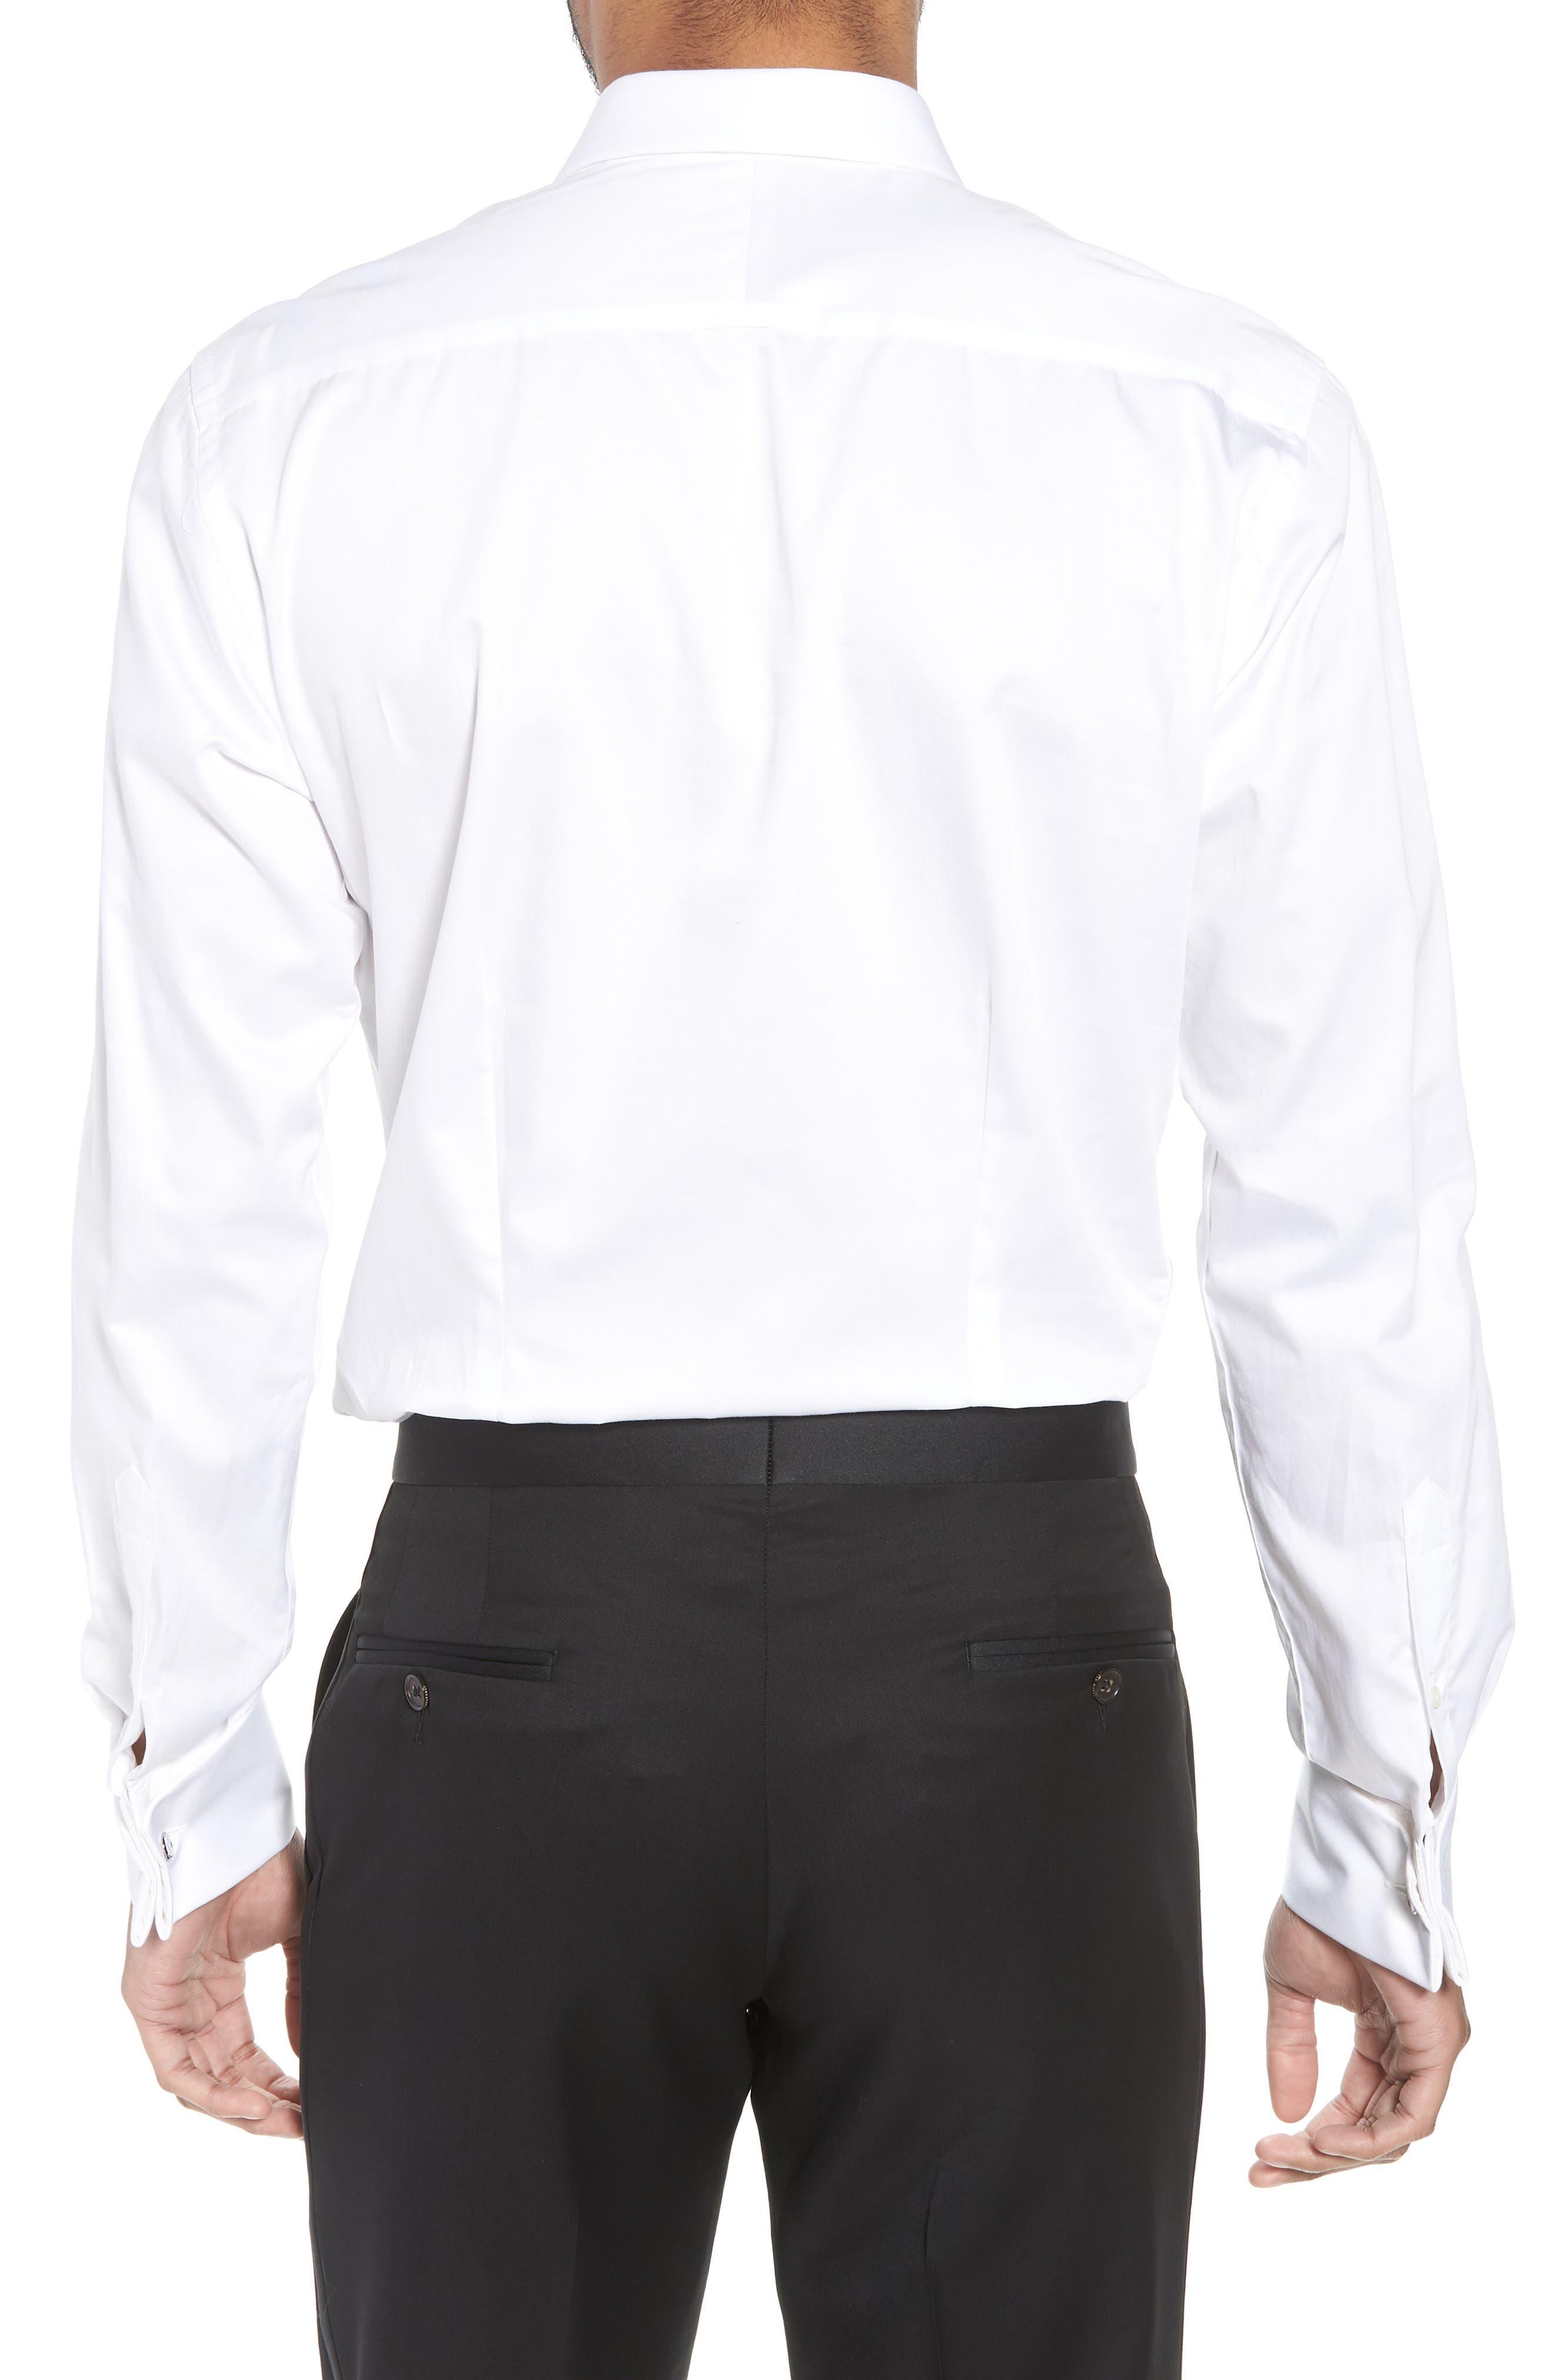 Fedra Trim Fit Tuxedo Shirt,                             Alternate thumbnail 3, color,                             WHITE